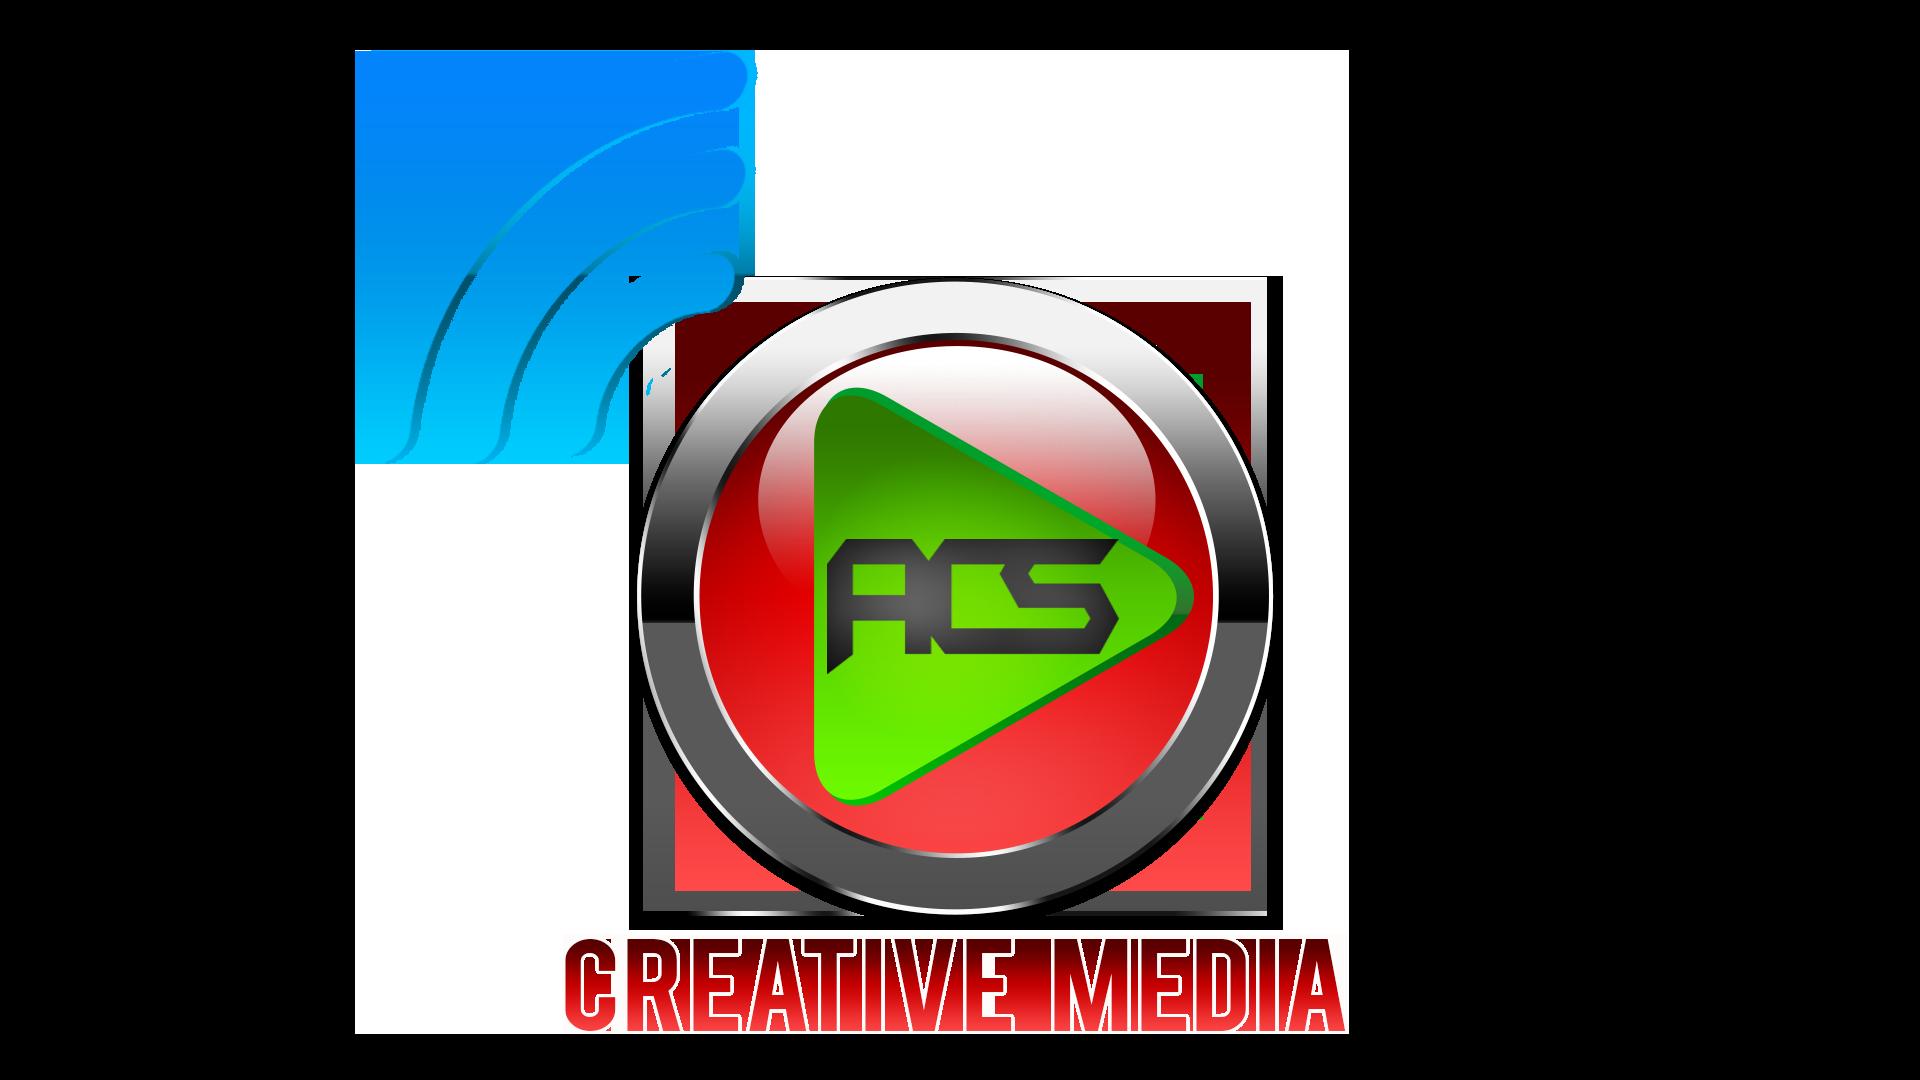 ACS Creative Media